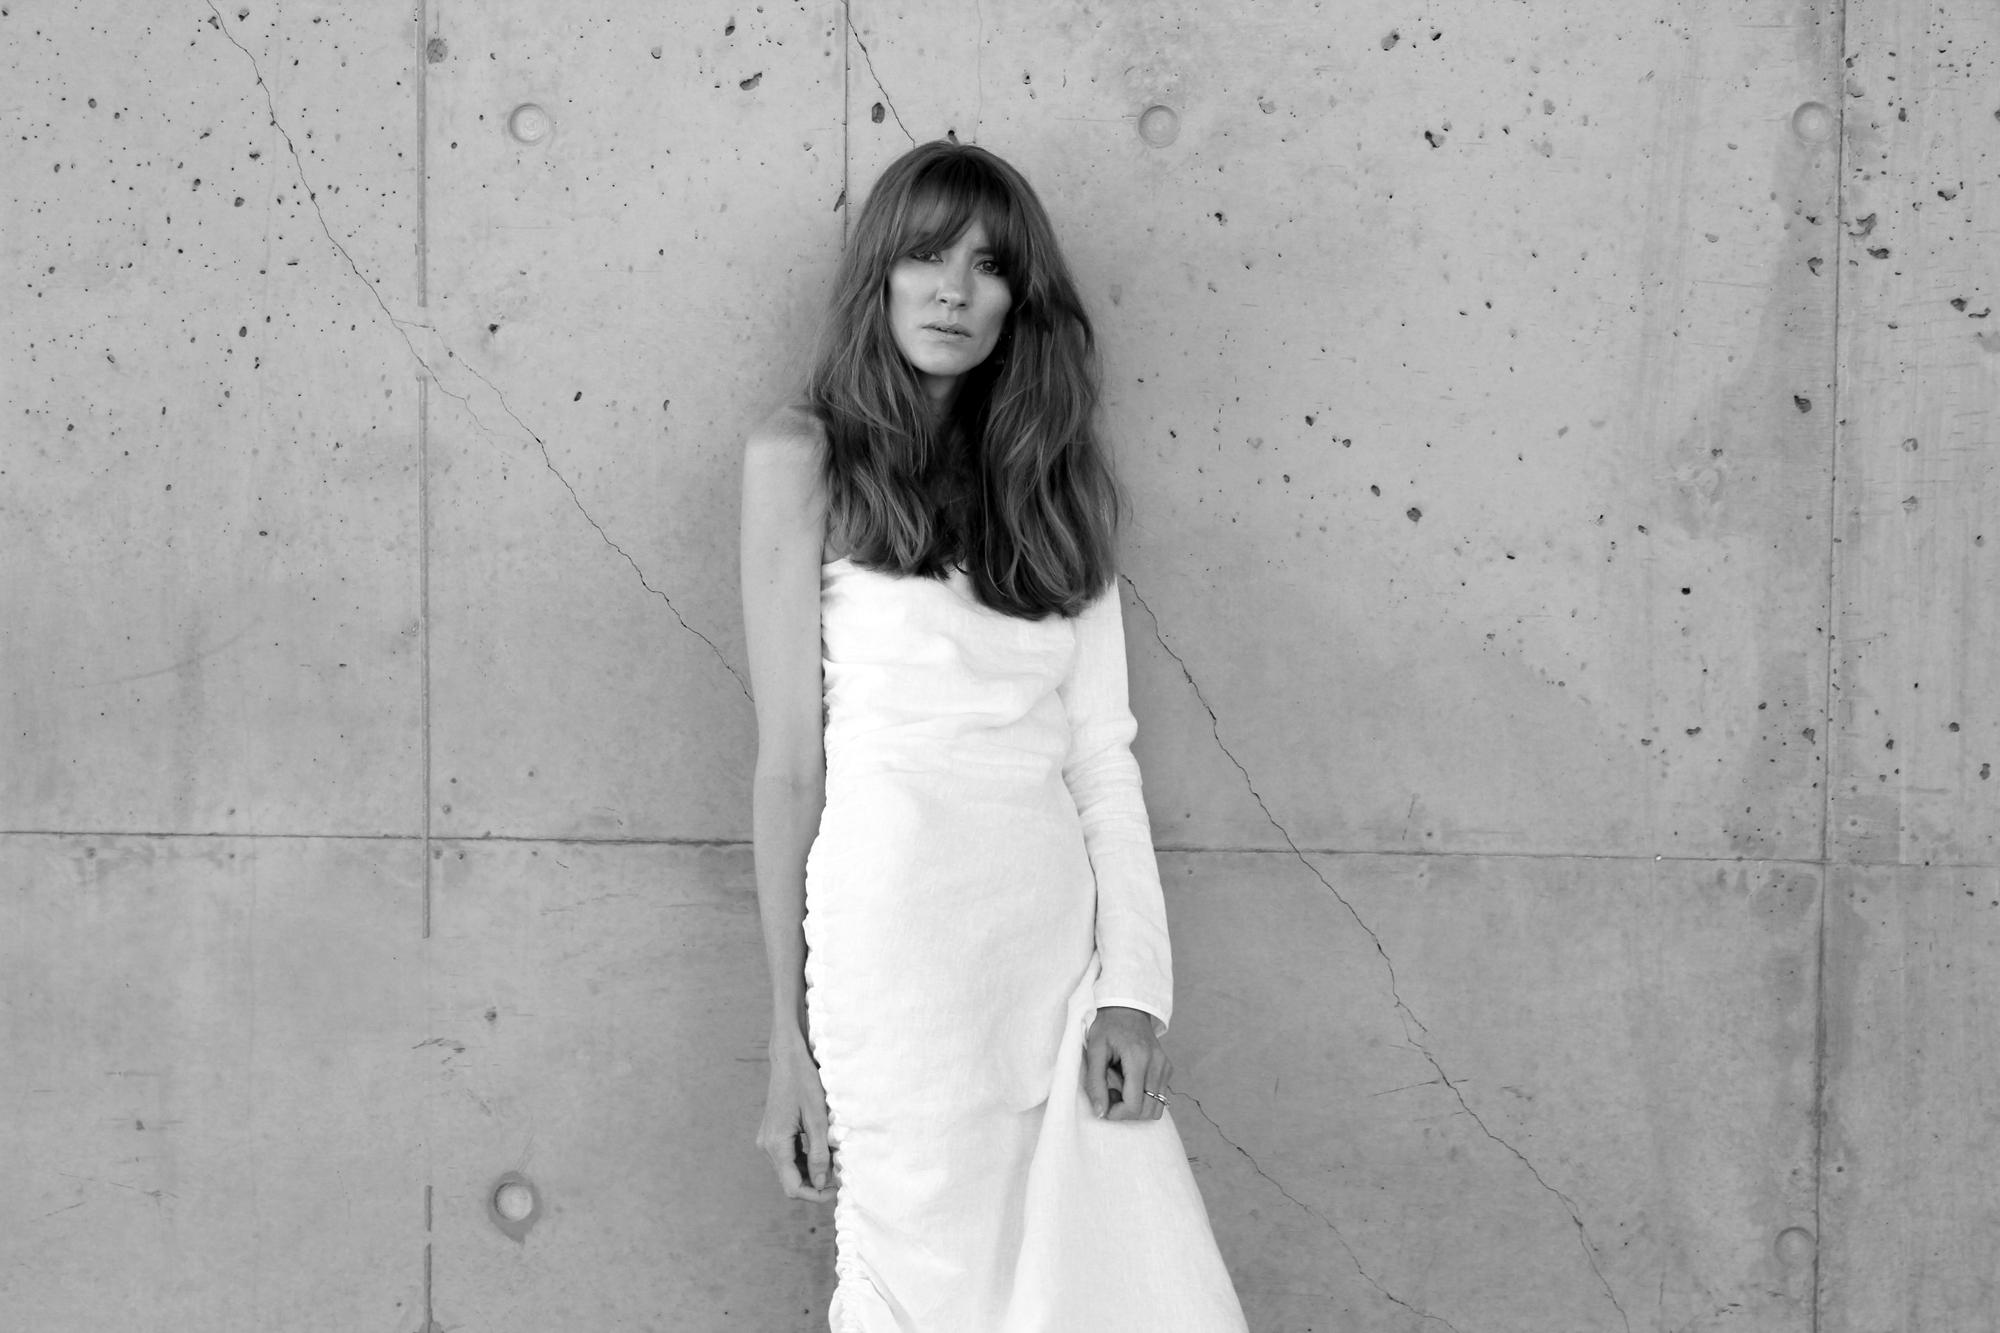 loverush_Georgia-Alice_white-linen_outfit-style_2-a